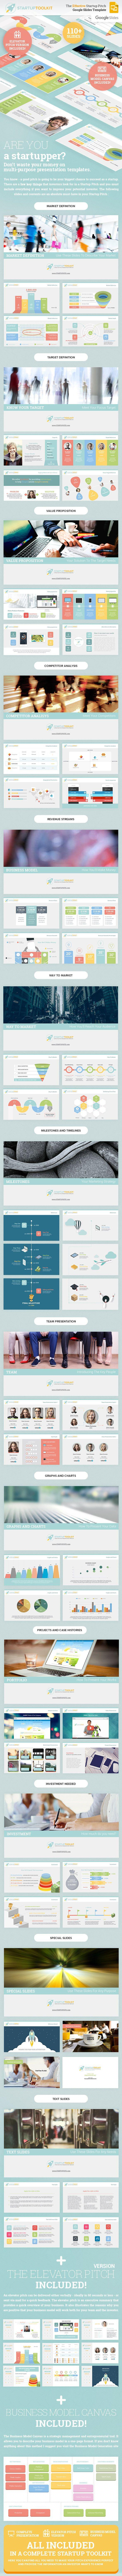 Startup Toolkit Google Slides - Google Slides Presentation Templates